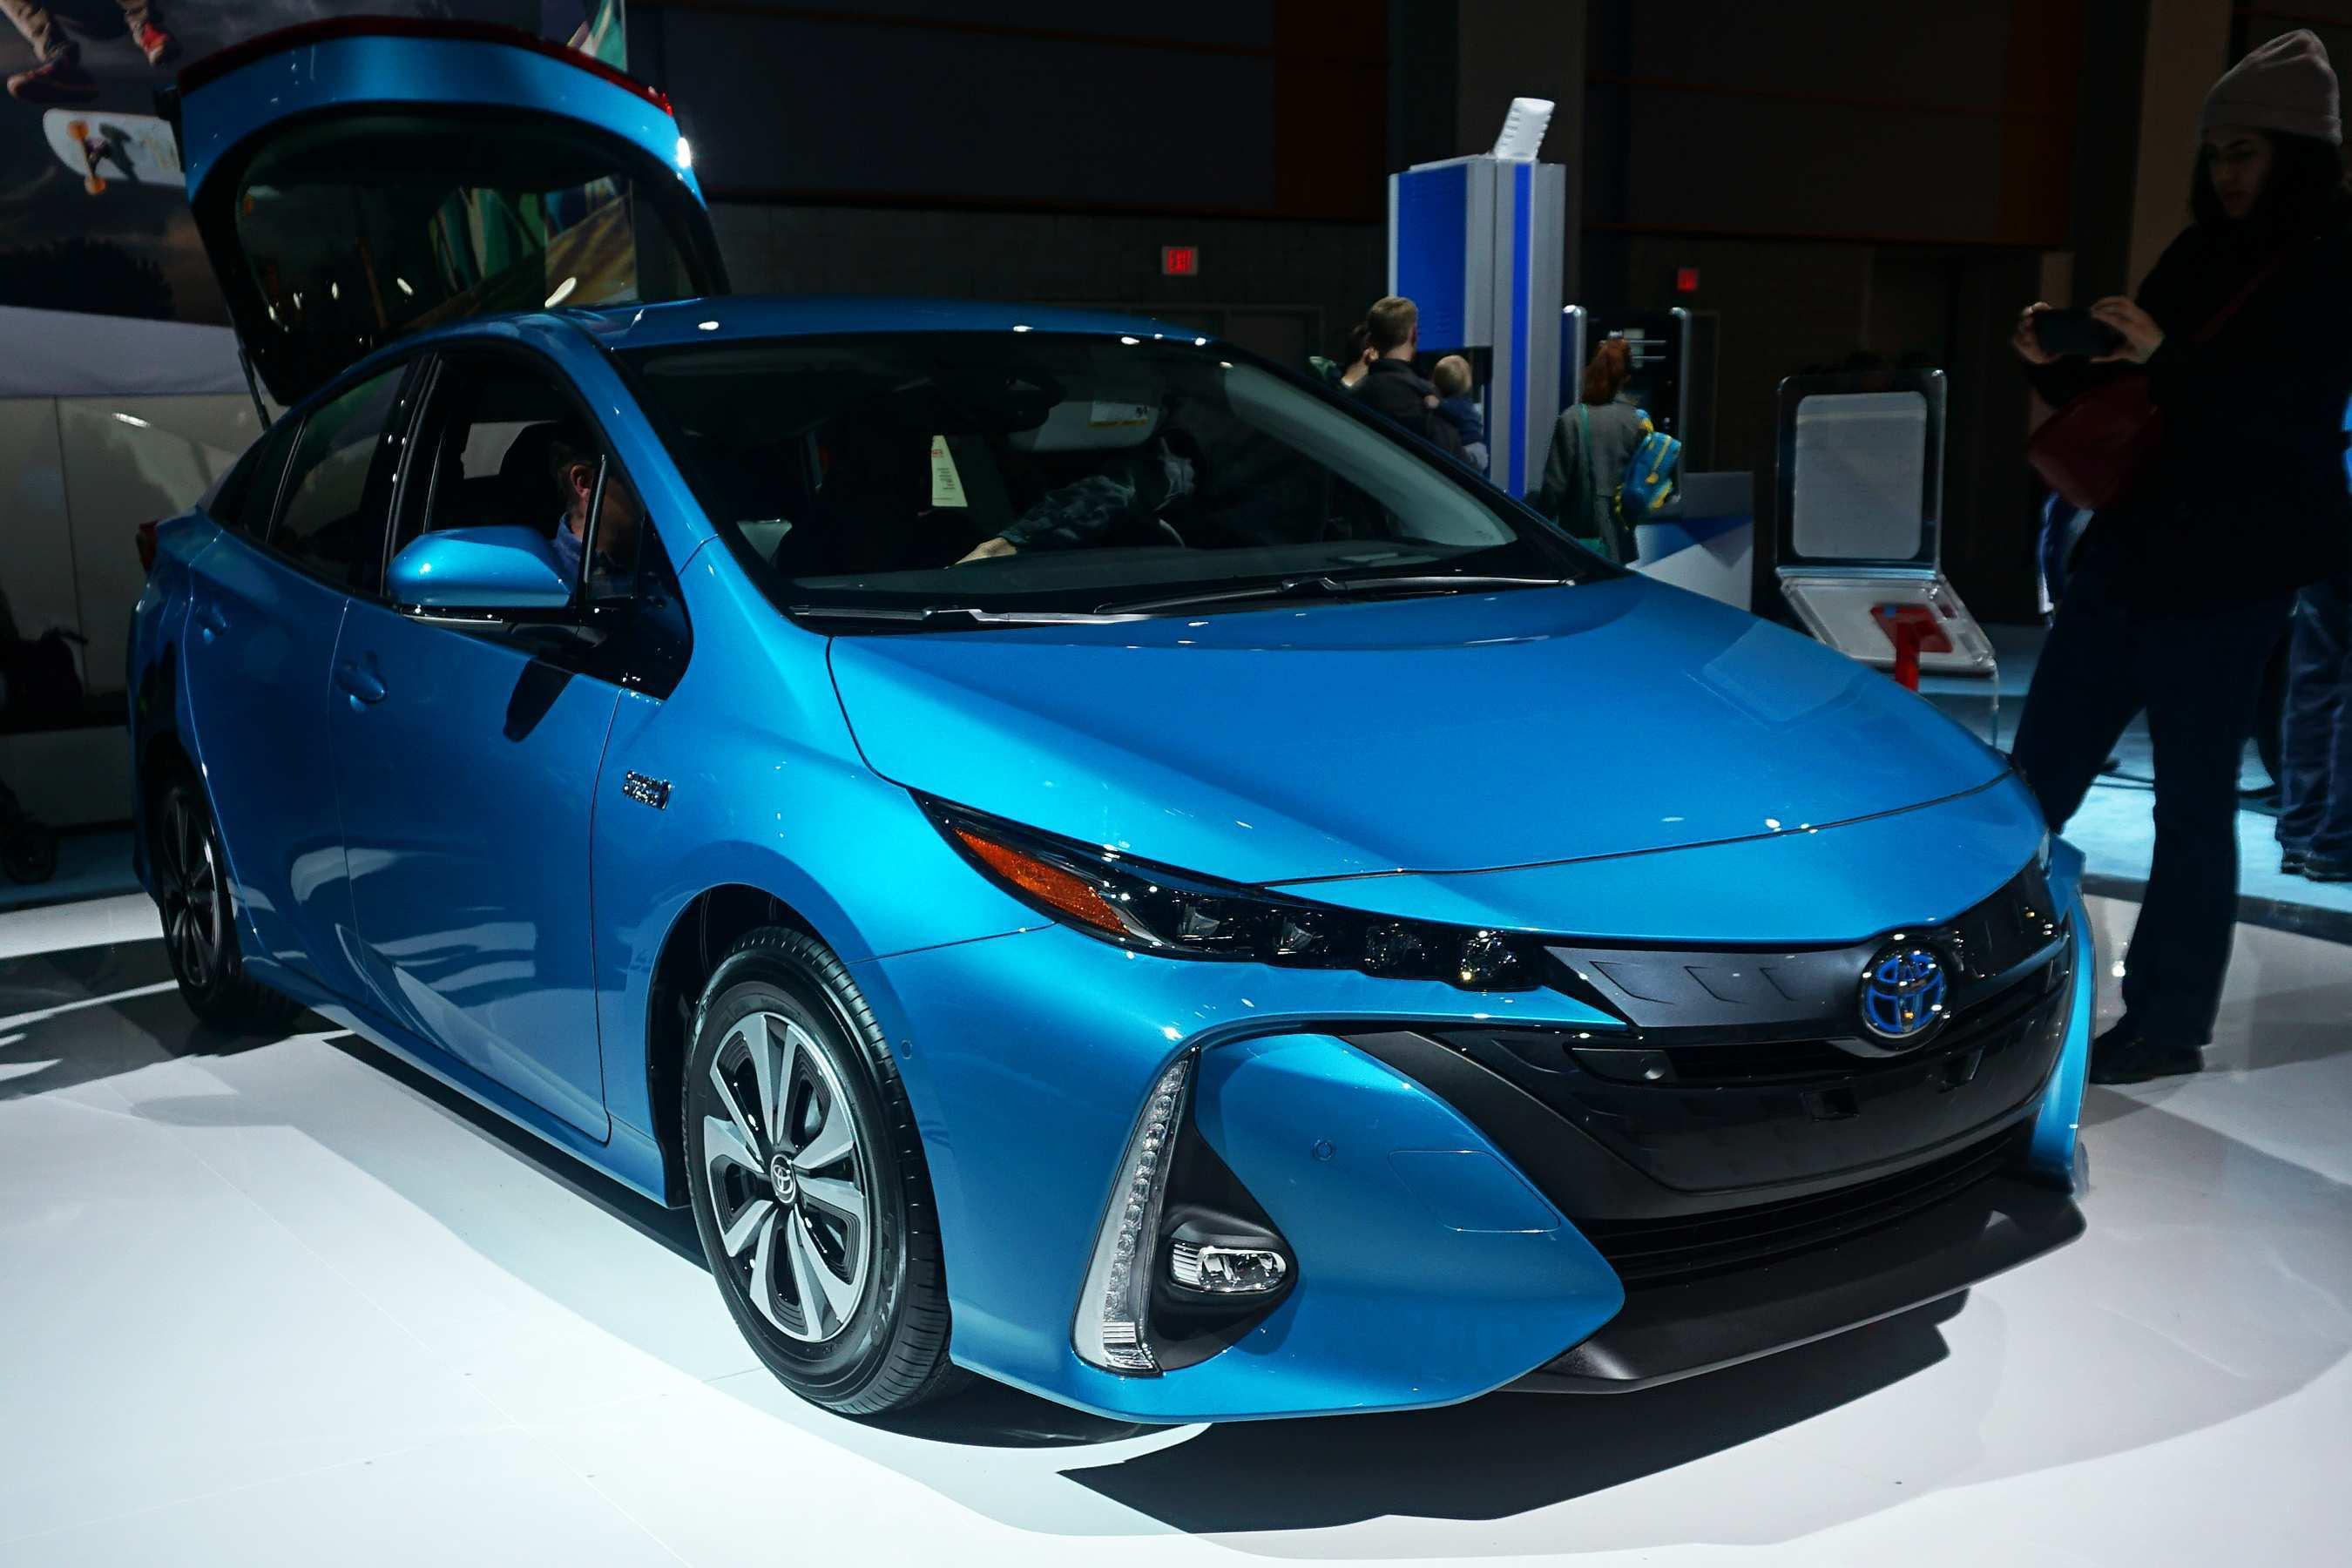 23 All New Best Prius Toyota 2019 Spesification Spy Shoot for Best Prius Toyota 2019 Spesification